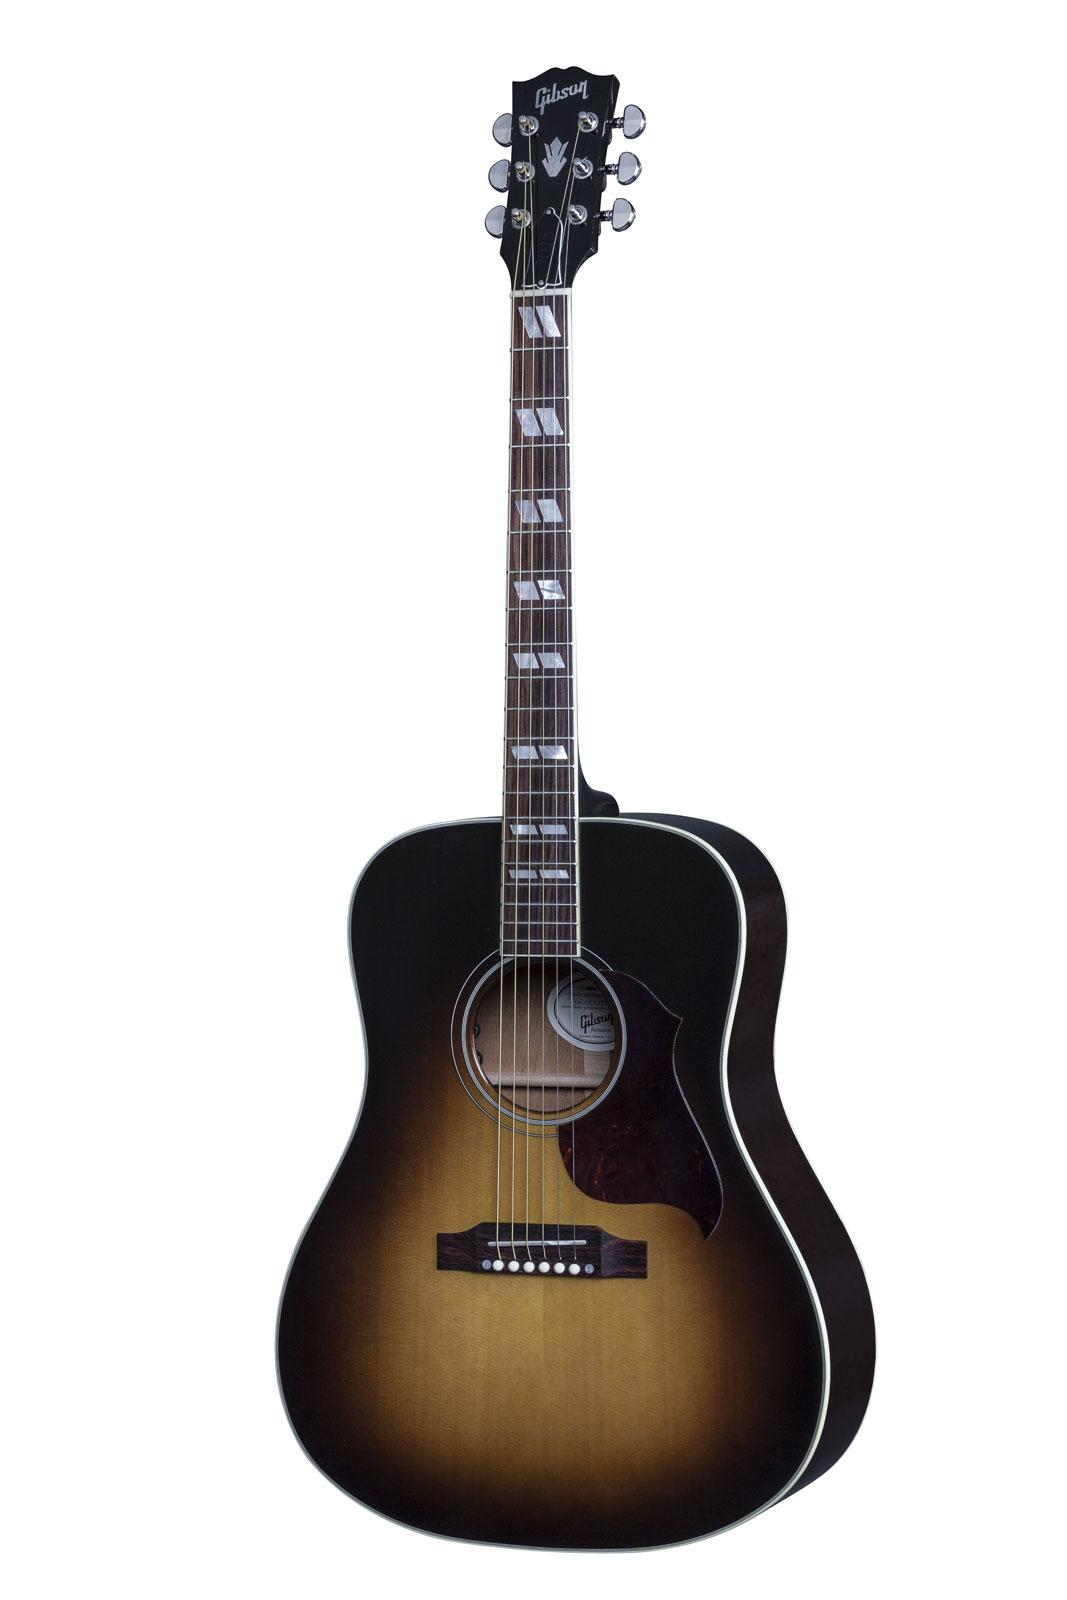 Gibson Hummingbird Pro 2016 Vintage Sunburst + Etui